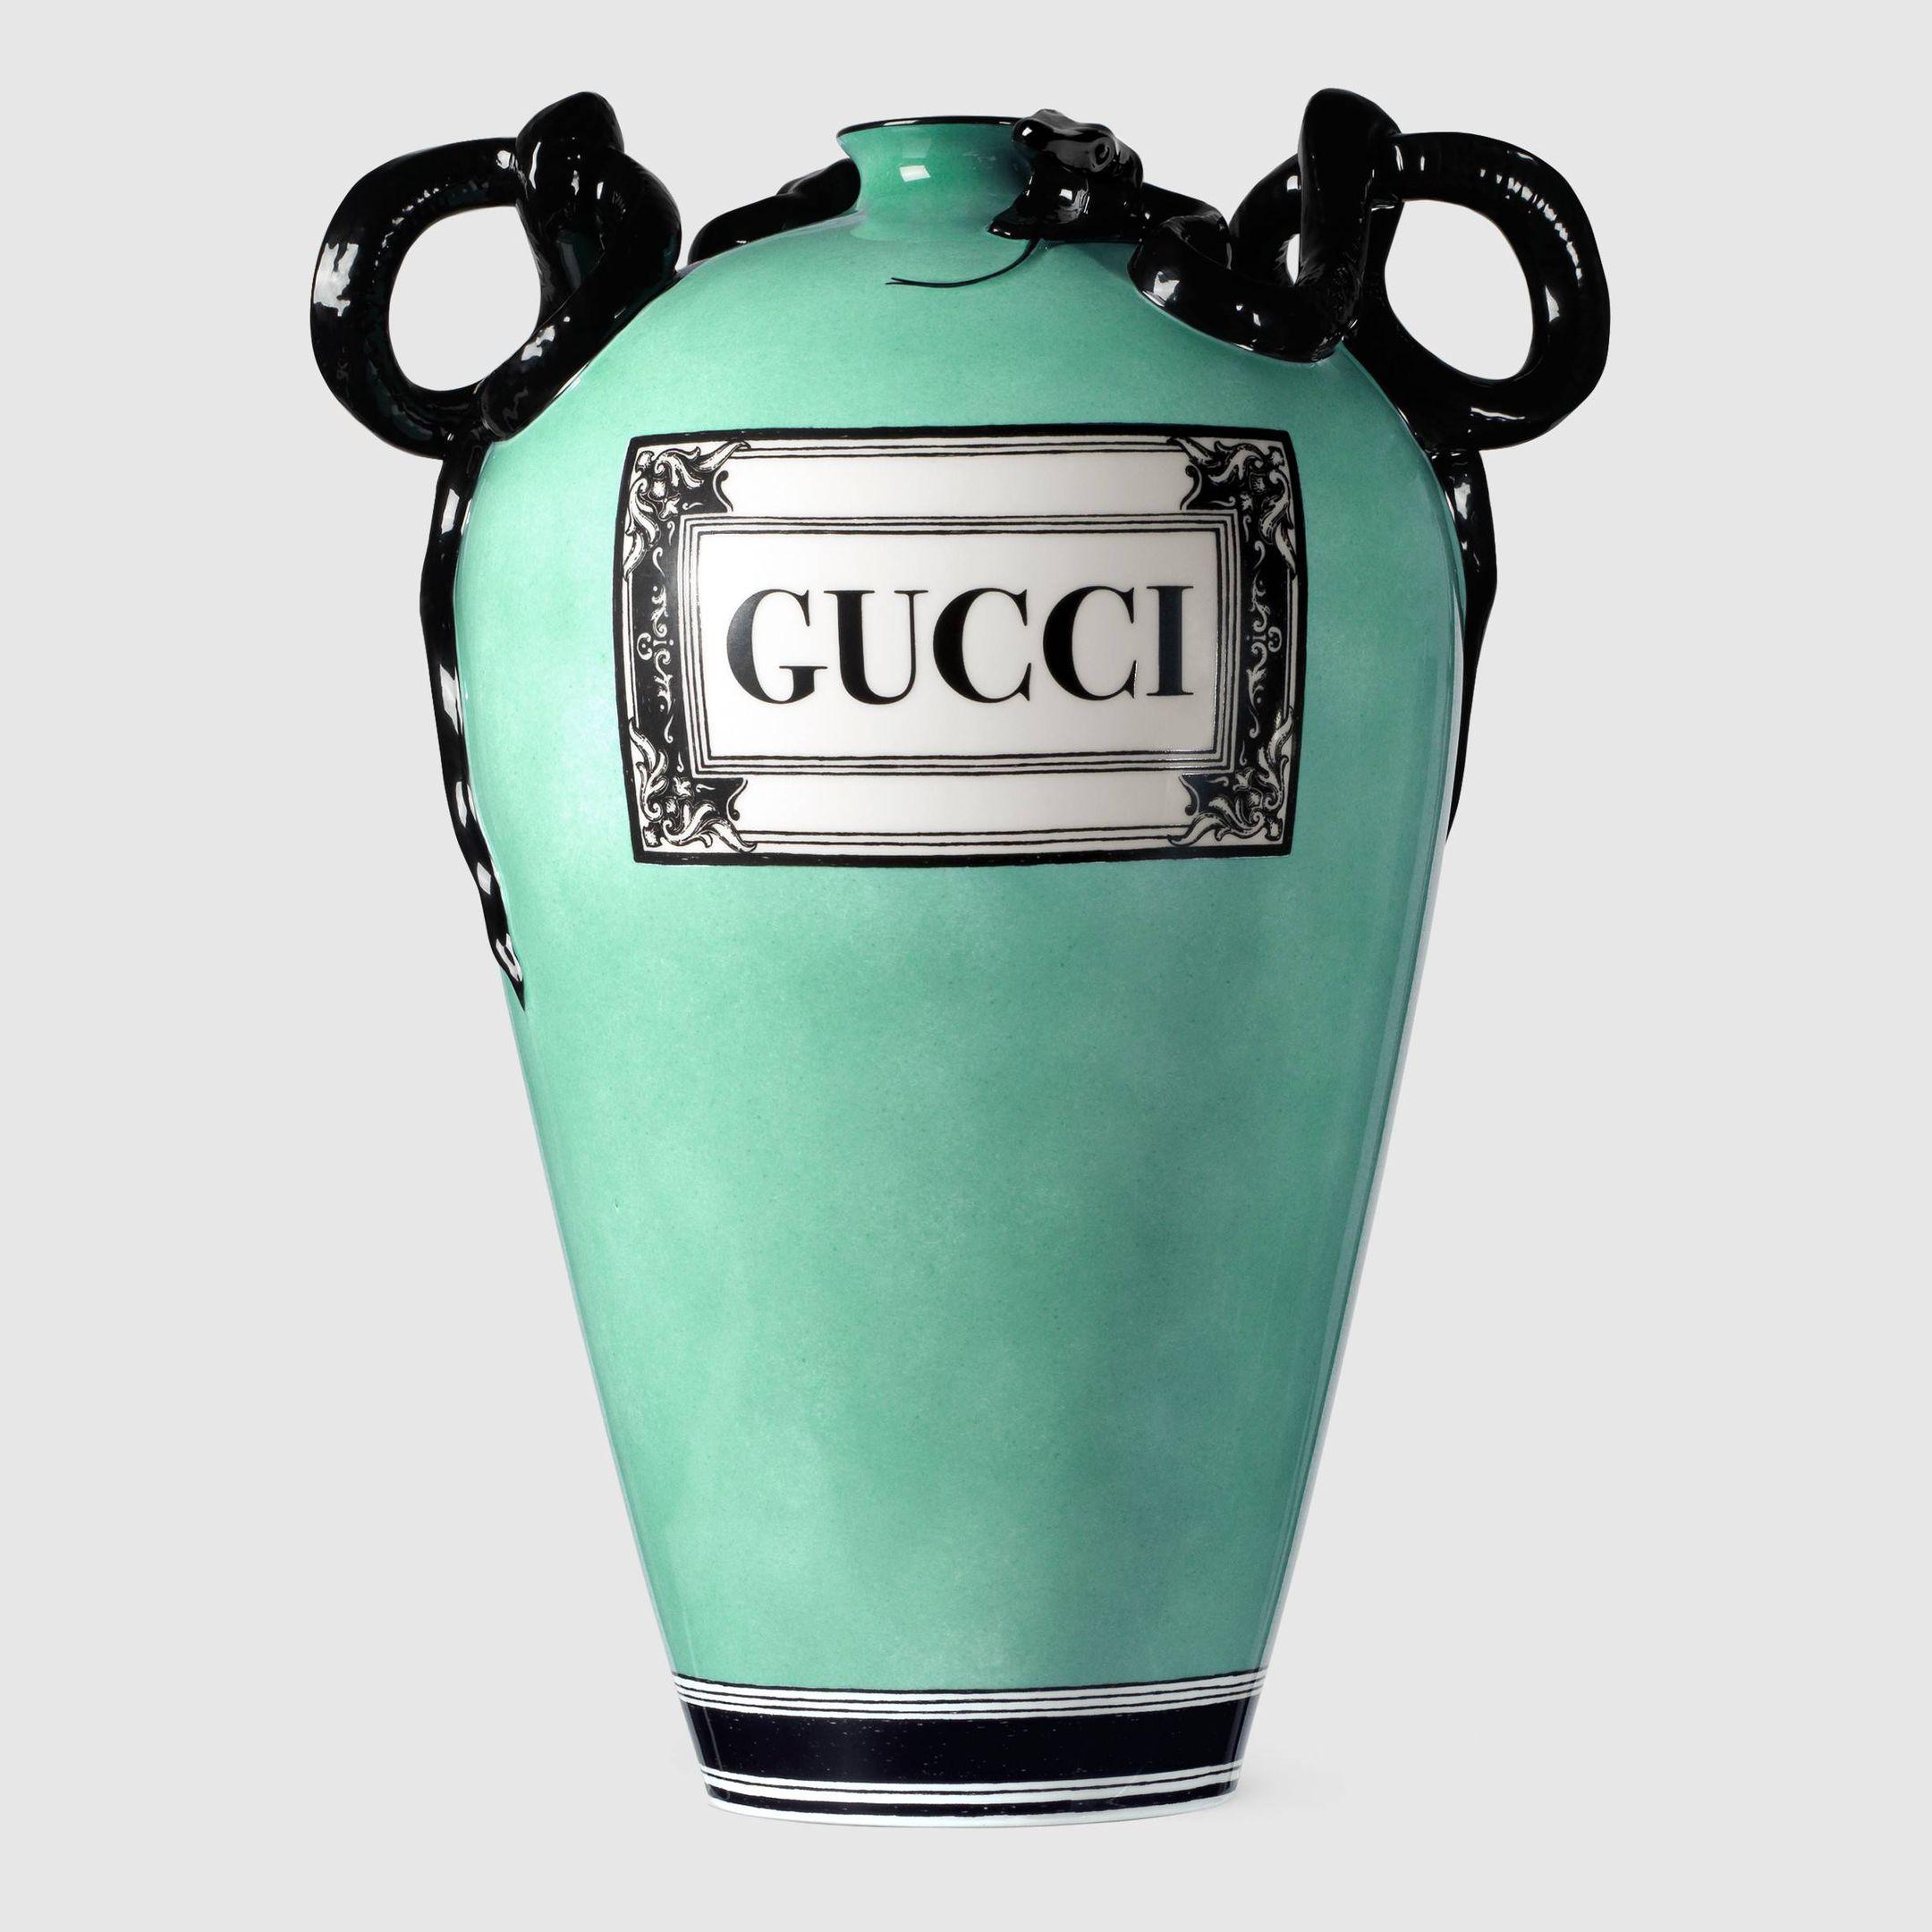 Vintage Vase, $7,770